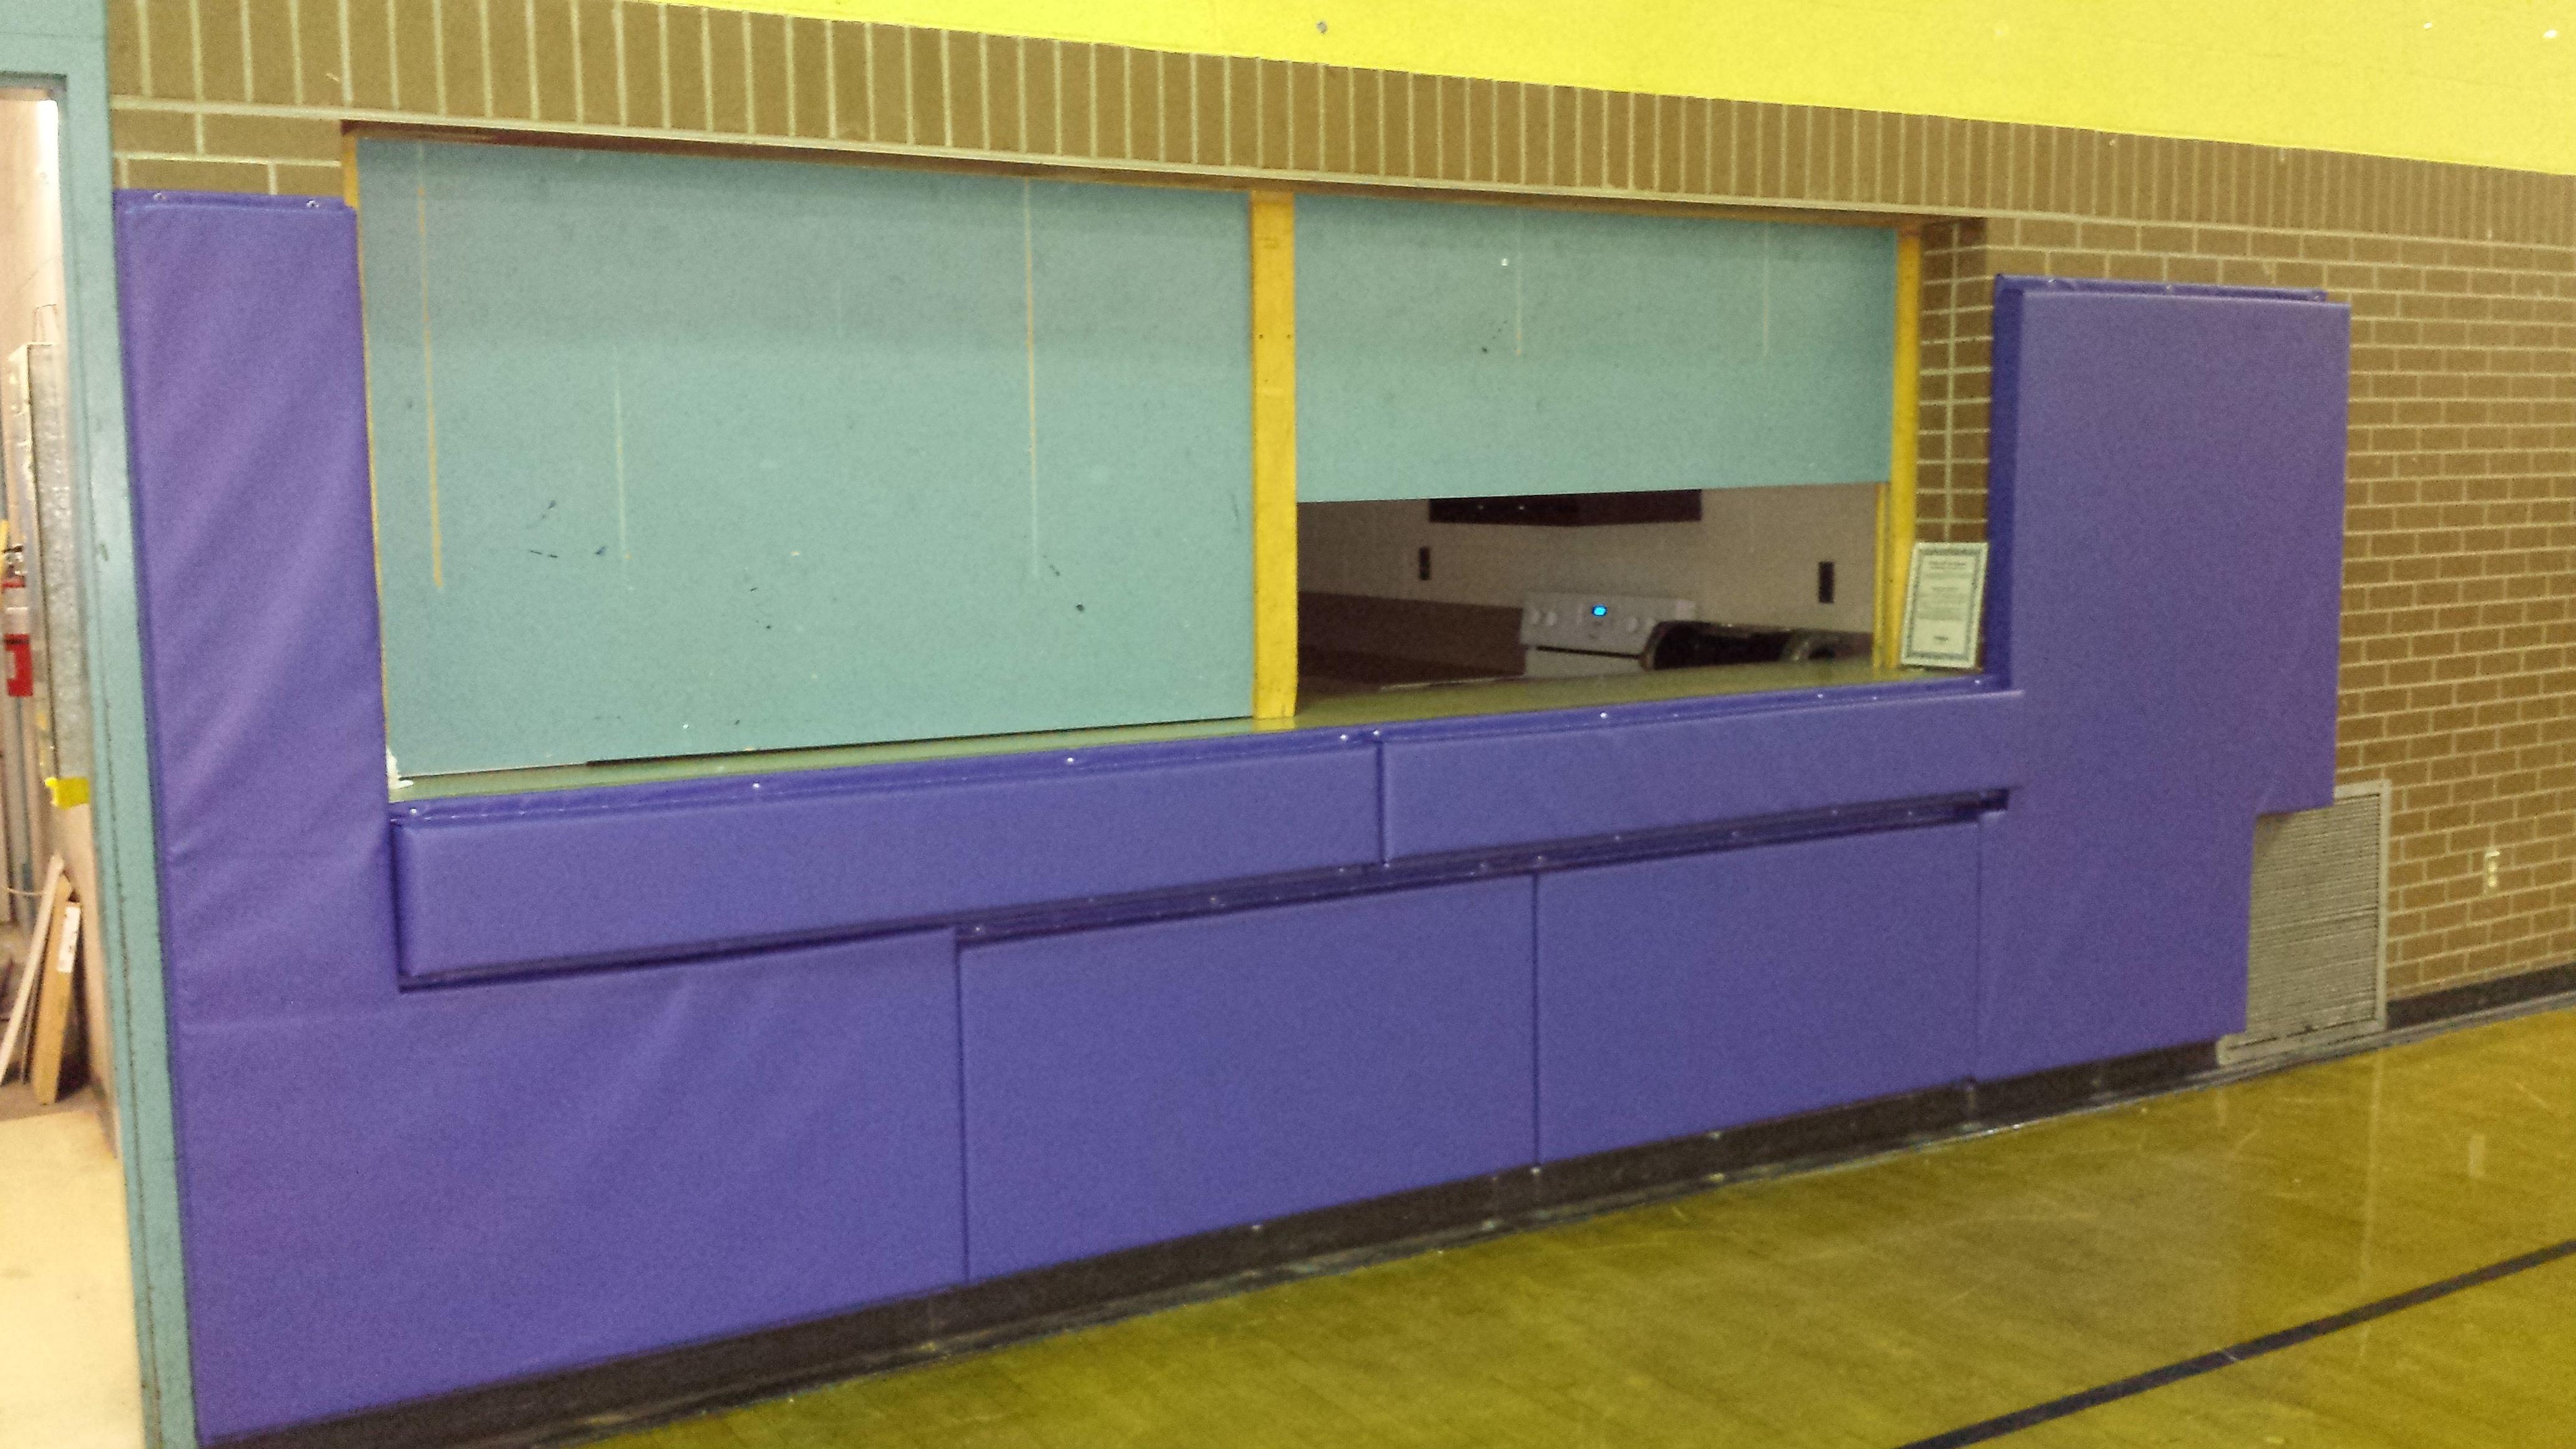 garnet-a-williams-custom-padding-on-wall-around-windows